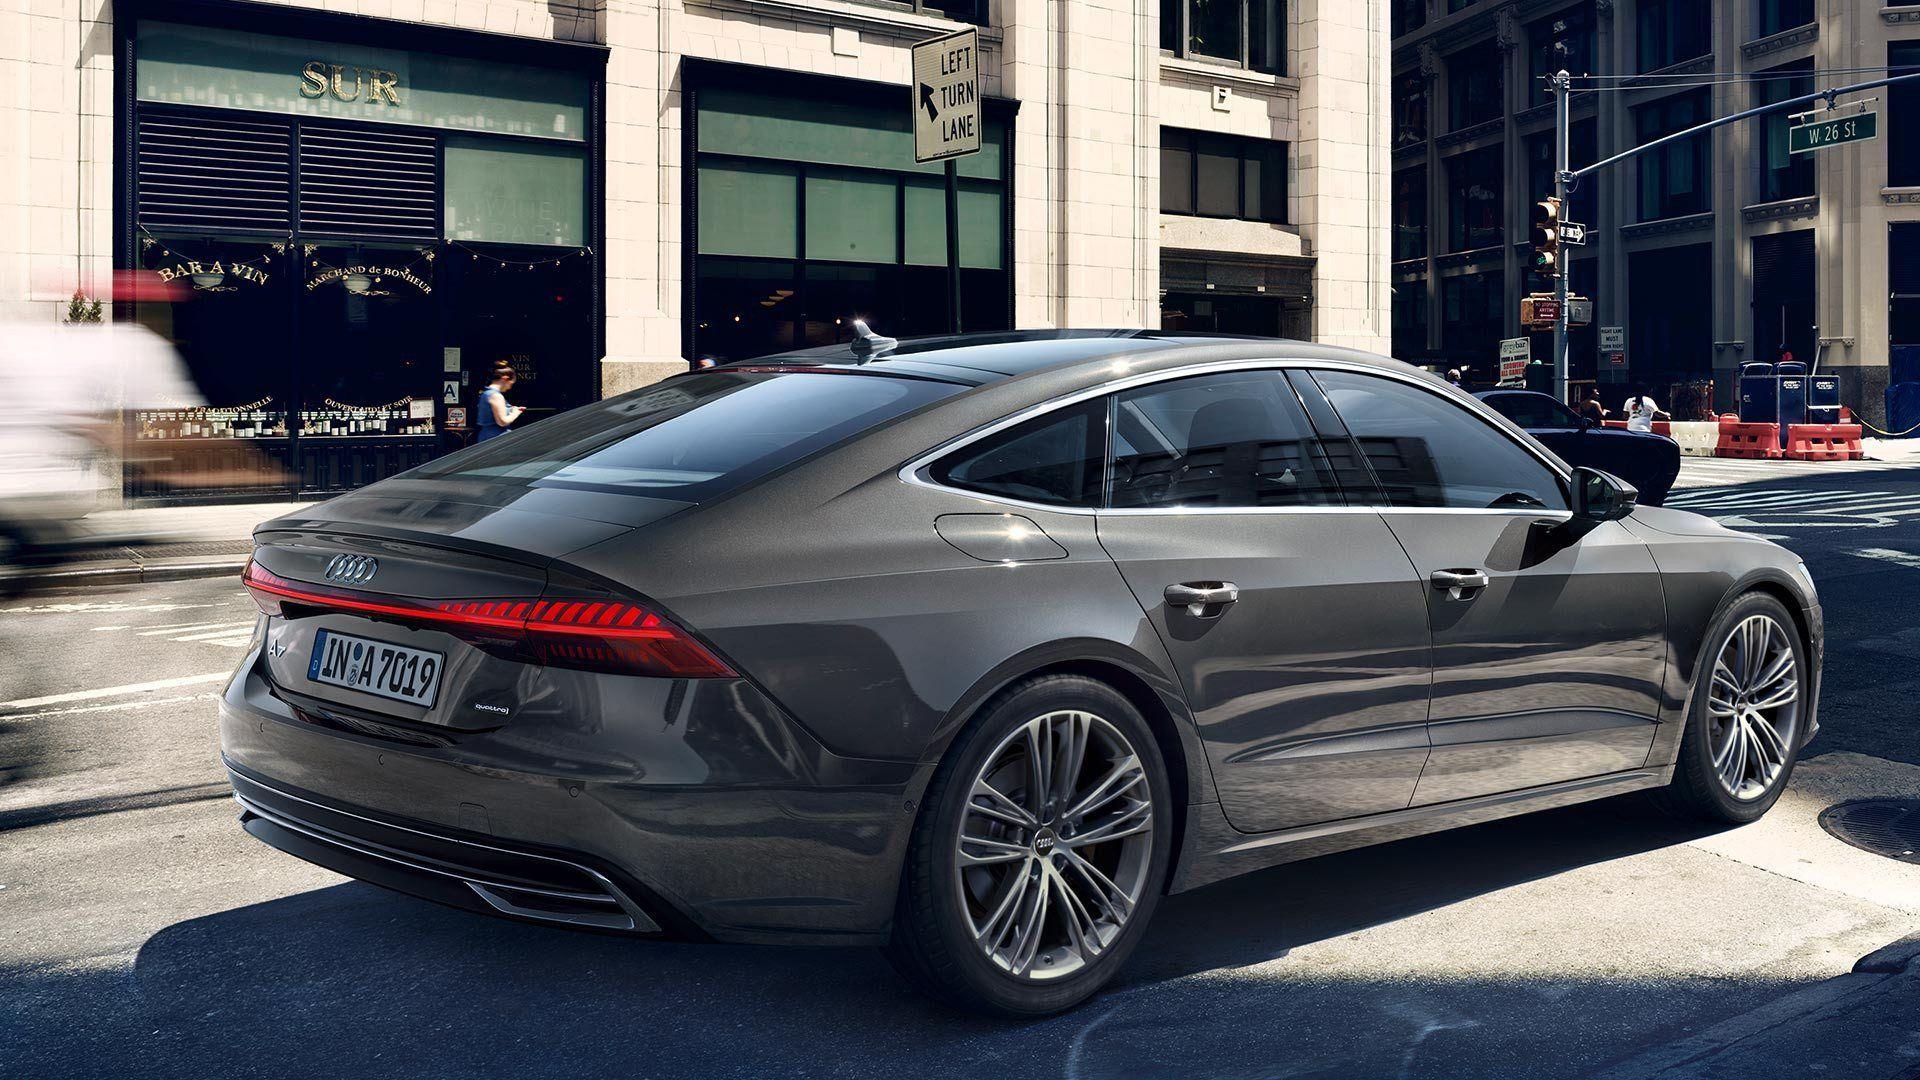 2020 Audi R8 LMXs Performance